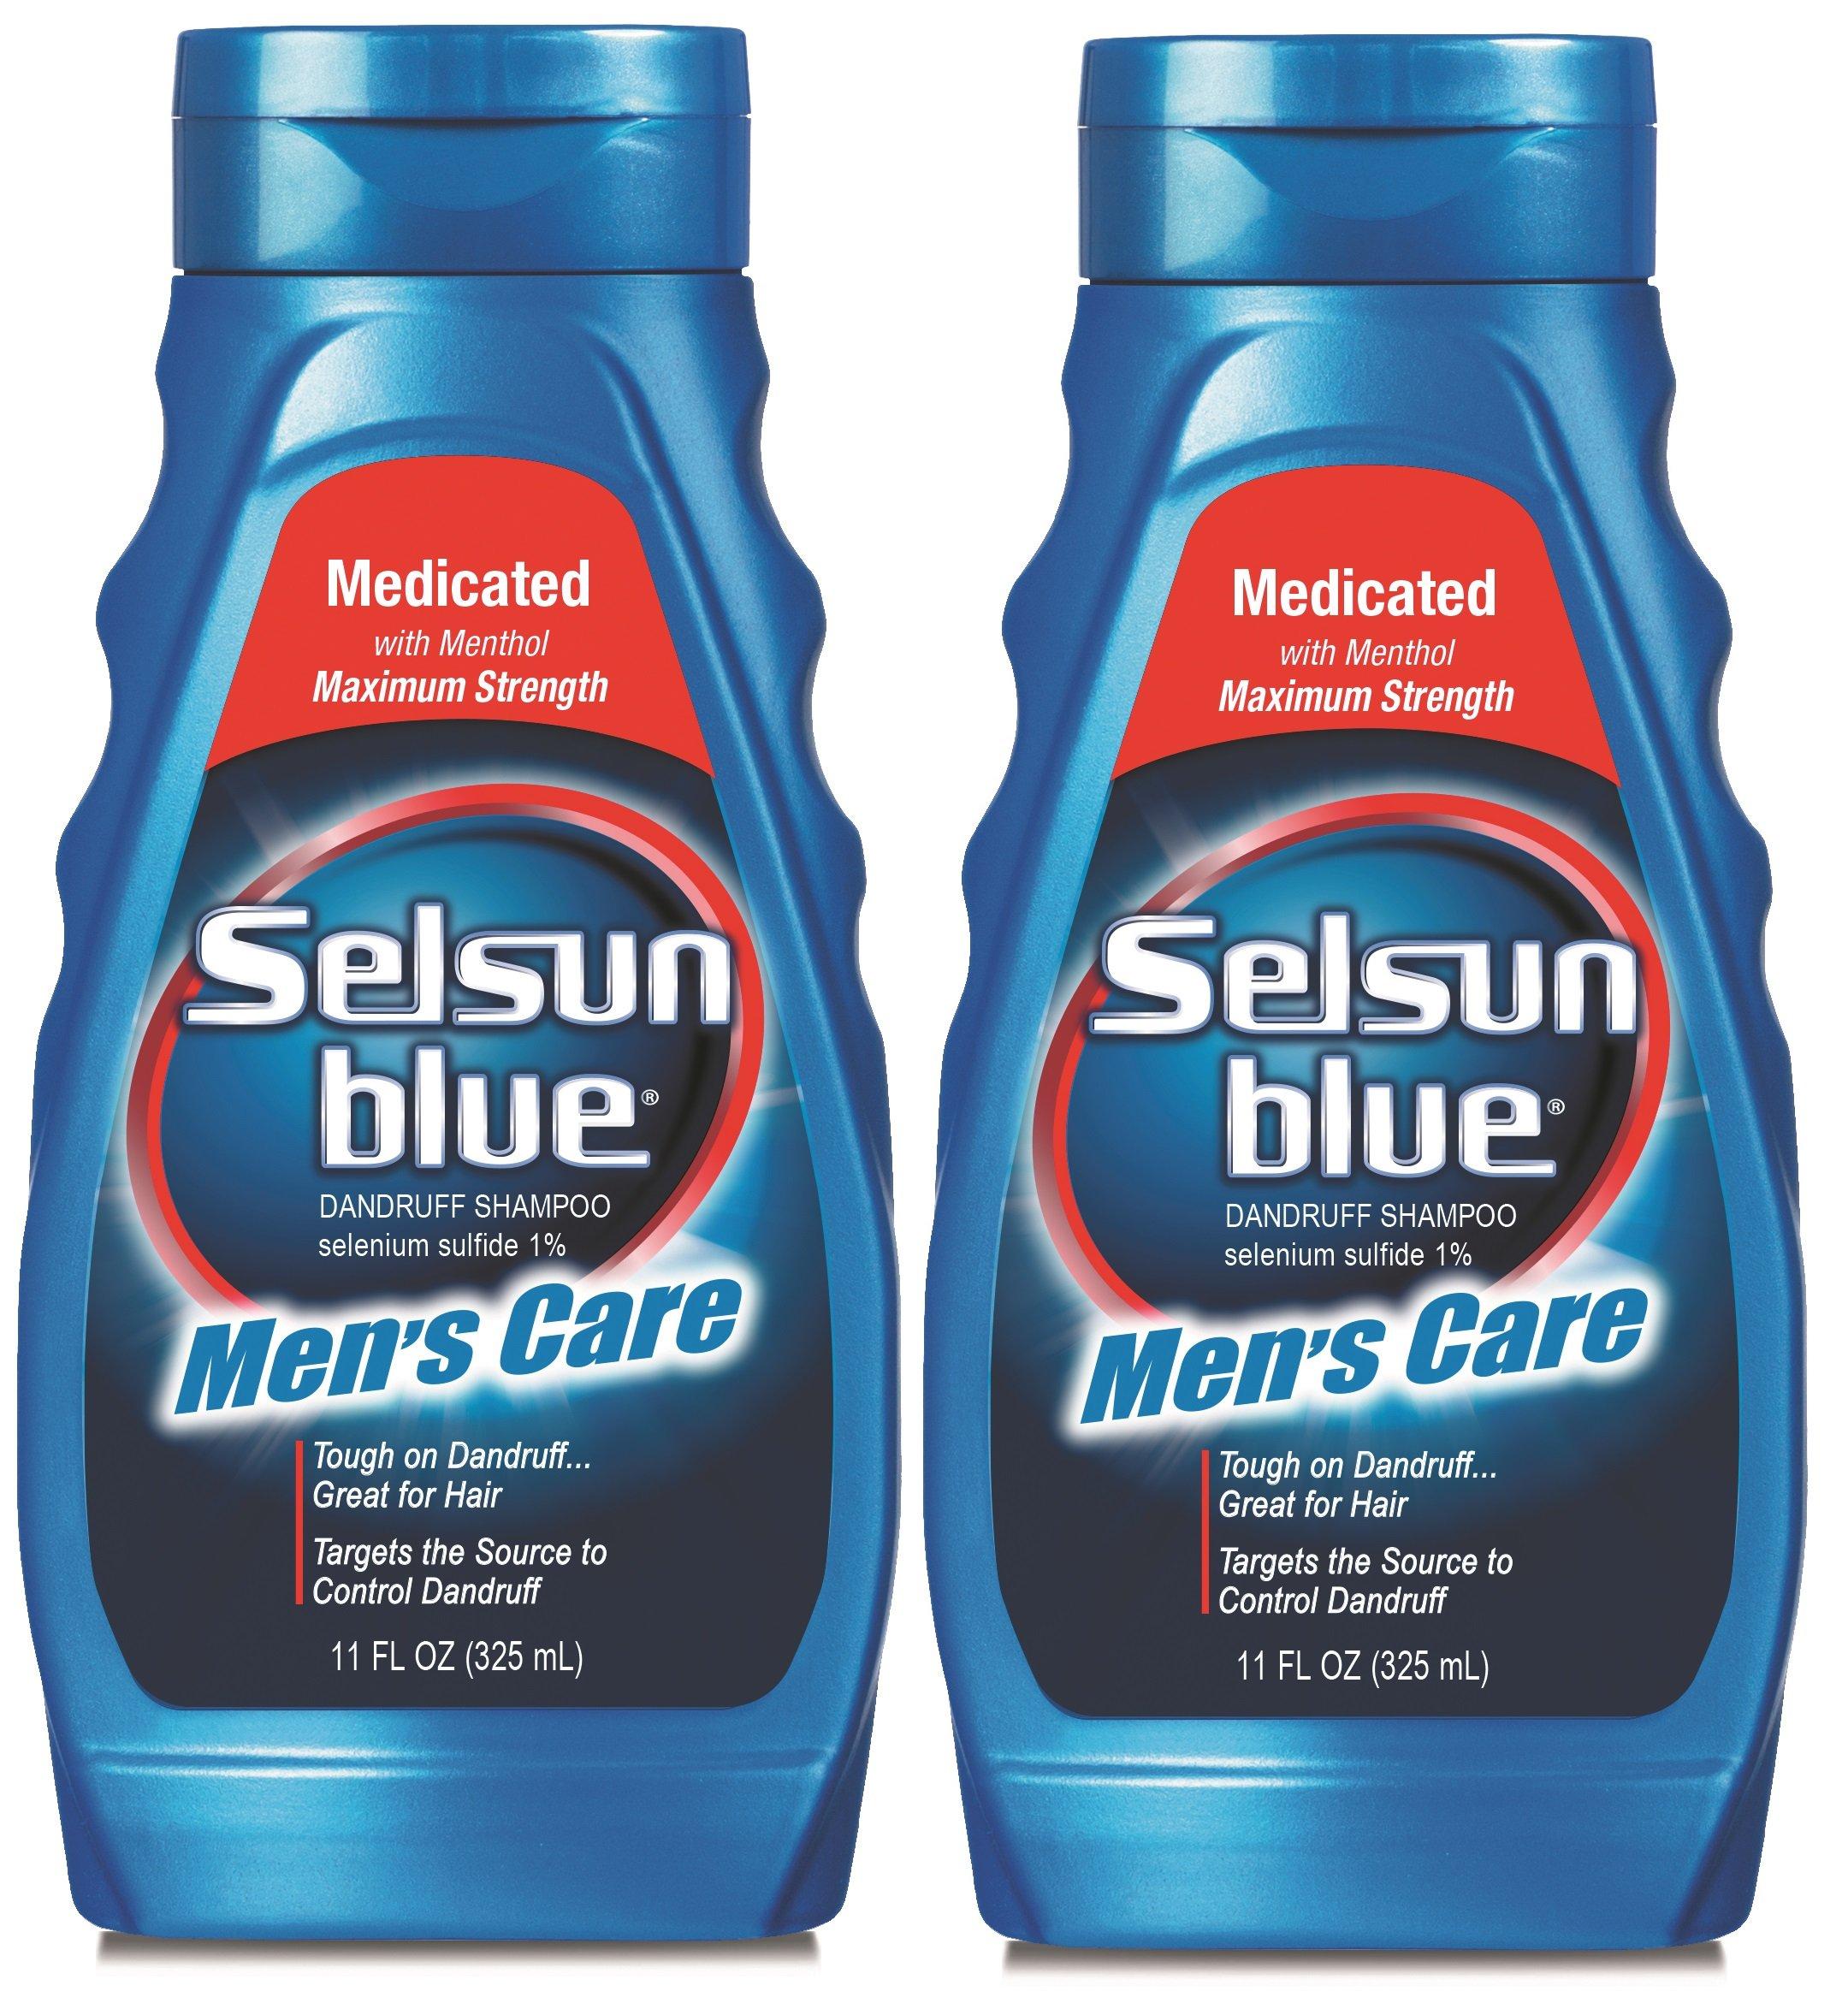 Selsun Blue Men's Care Dandruff Shampoo, 11 Ounce (Pack of 2) by Selsun Blue